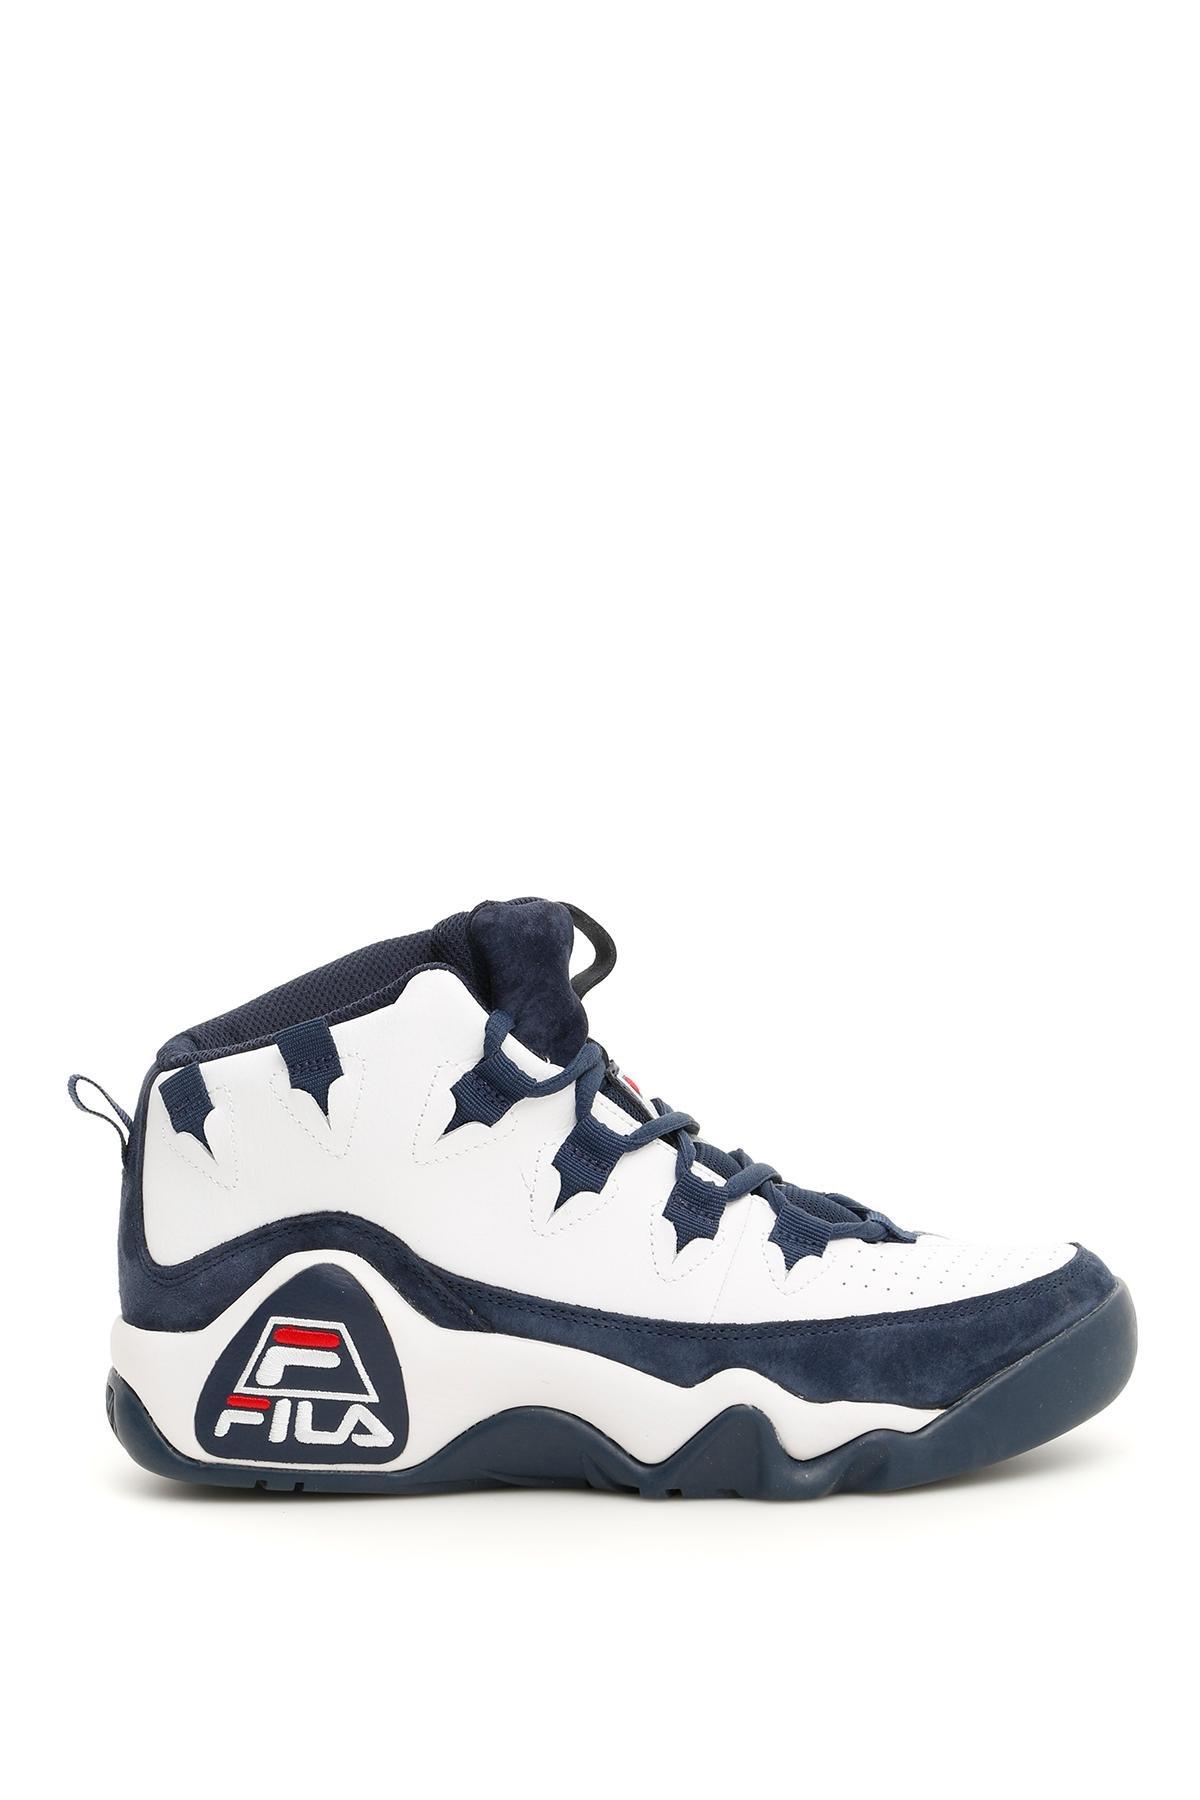 e4fe4ac267f Fila - Blue Grant Hill Sneakers for Men - Lyst. View fullscreen